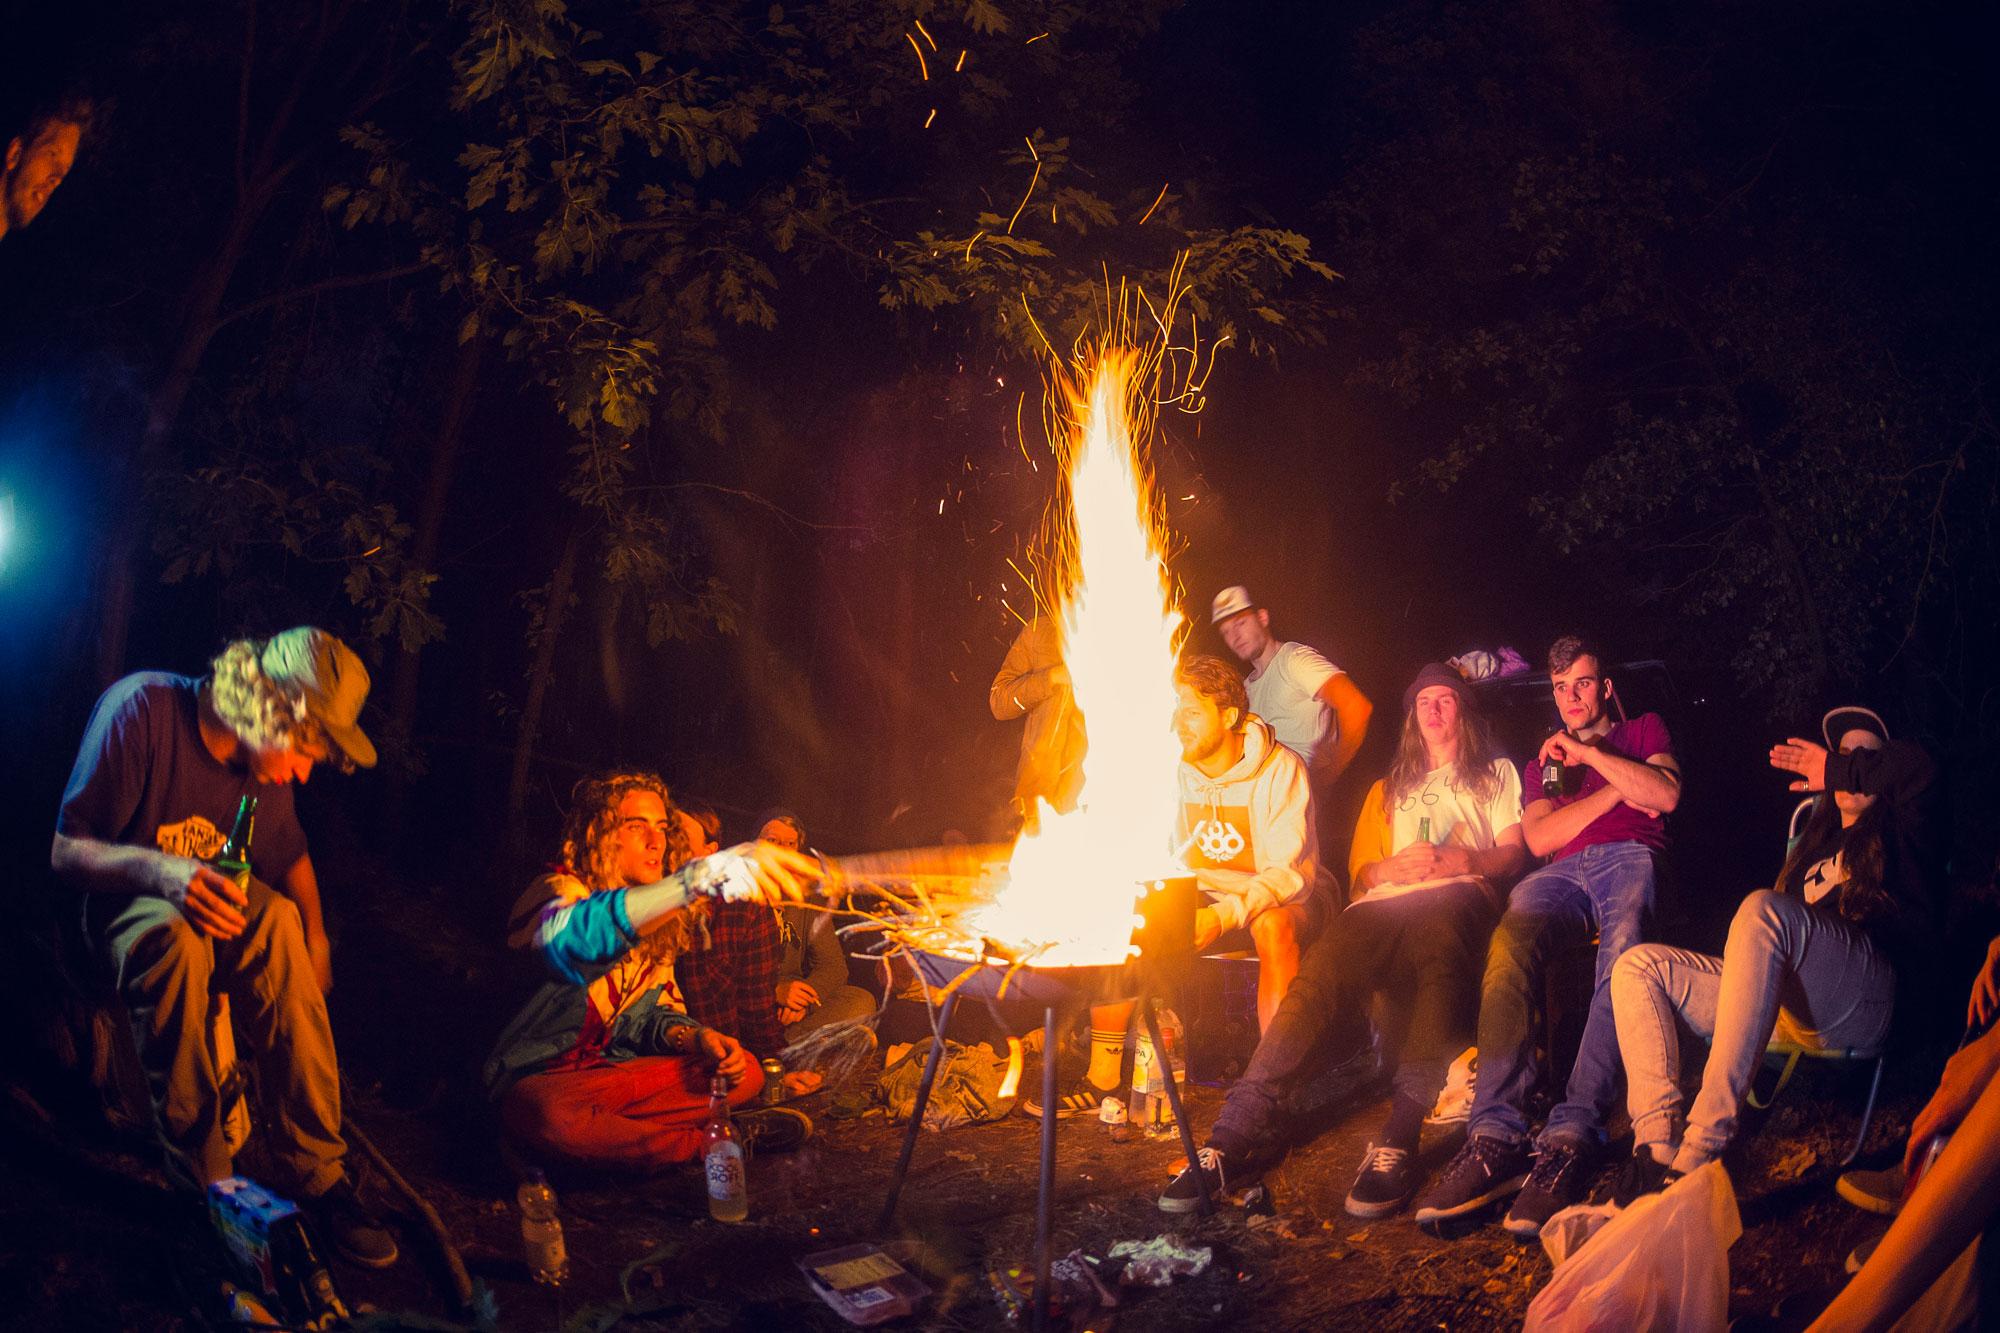 Camp vibes. Photo: Tim Schiphorst